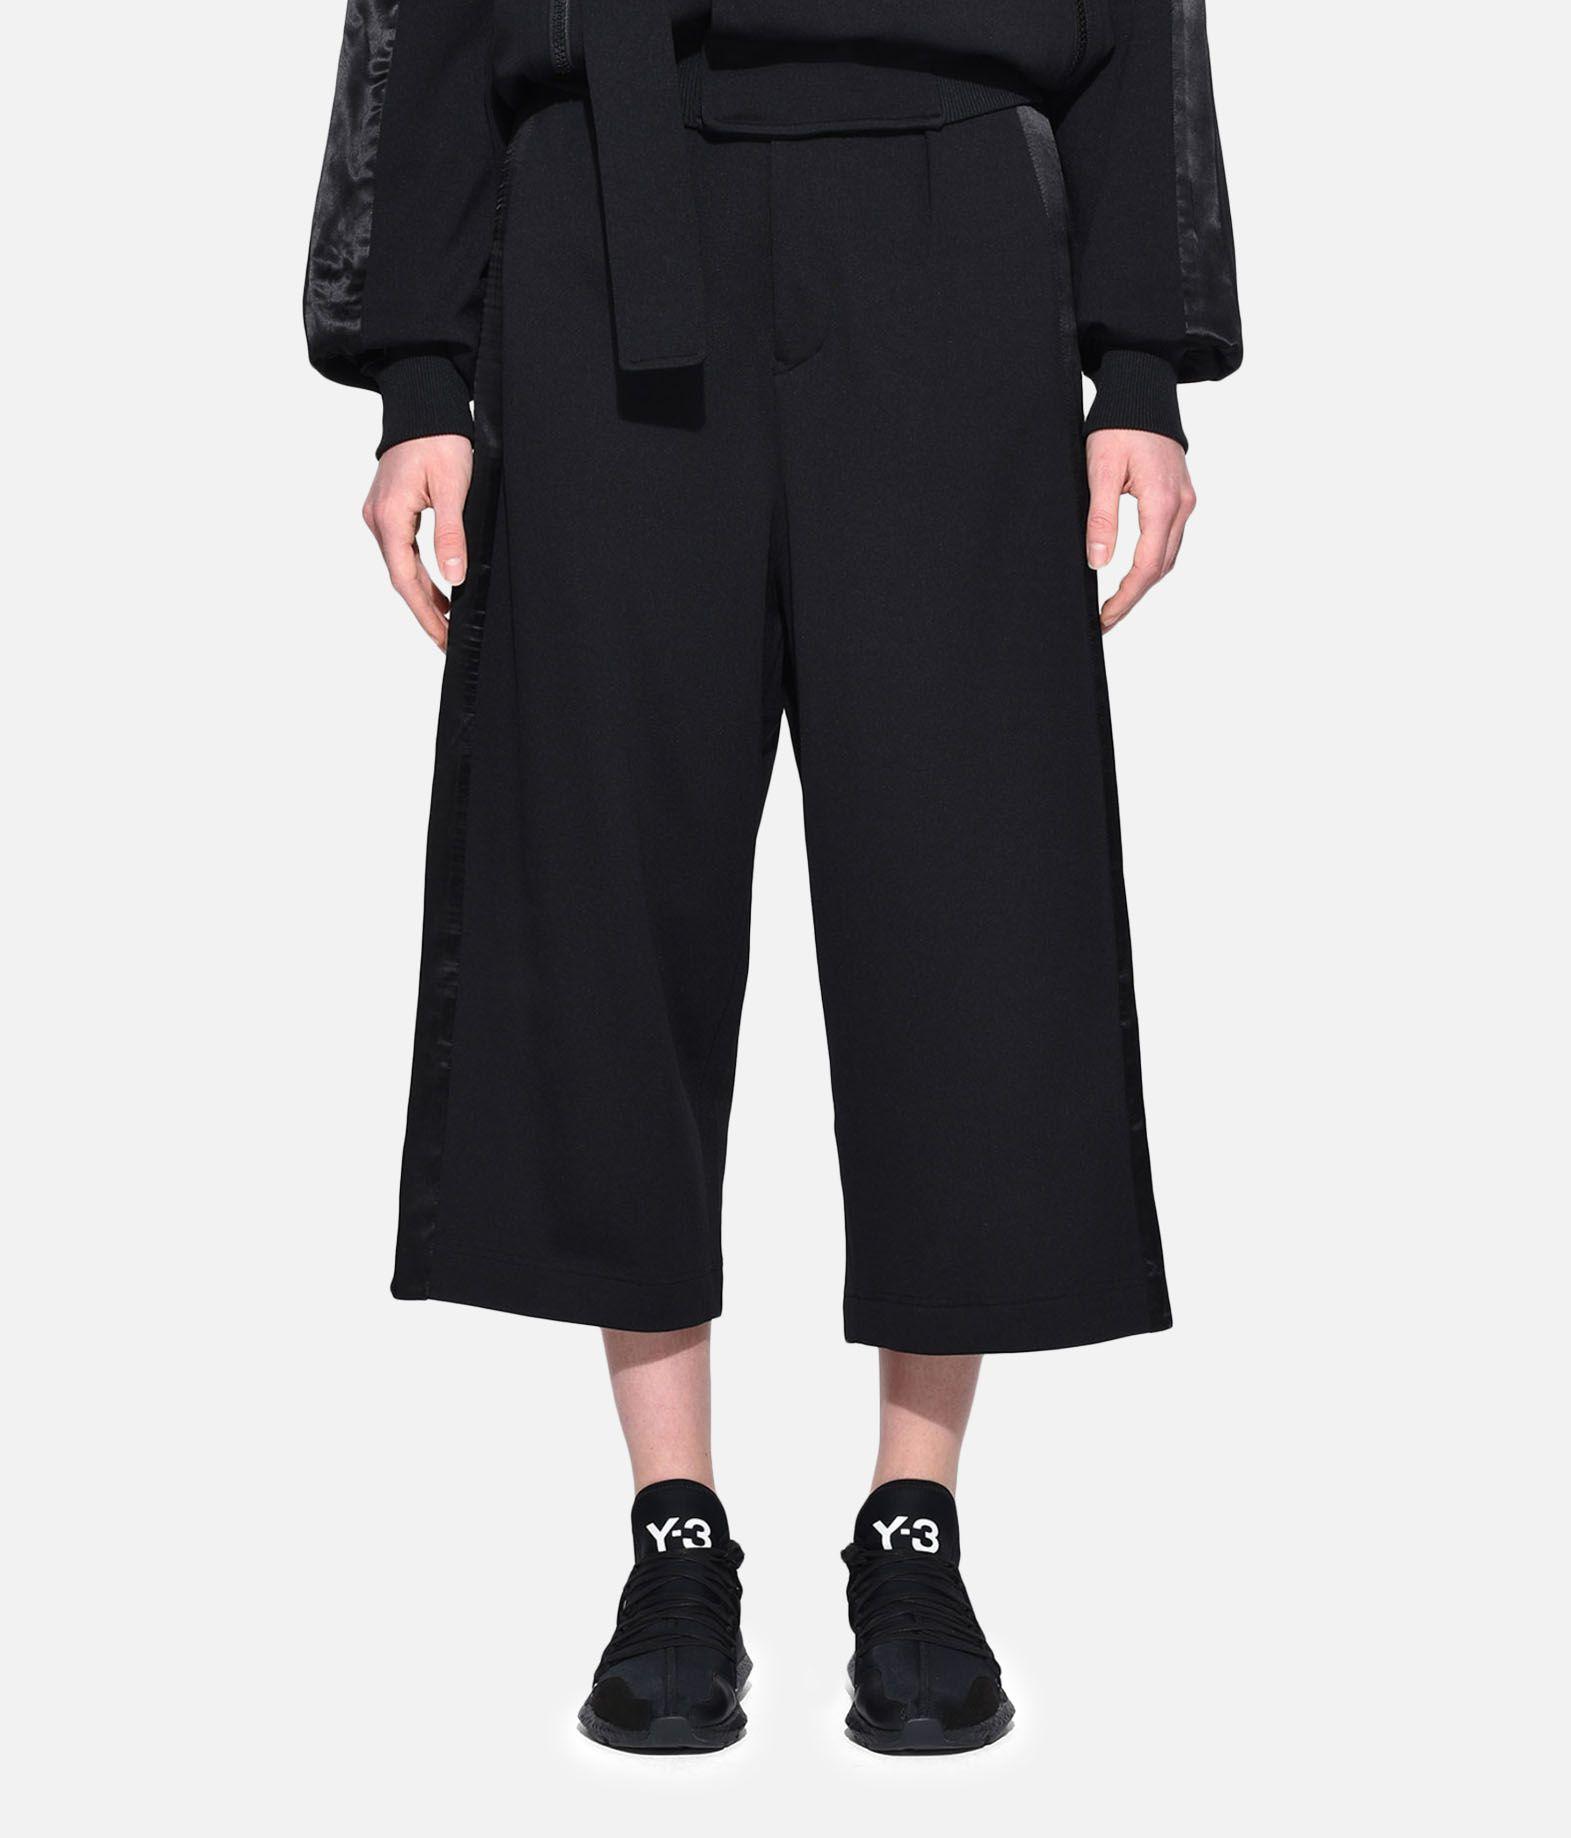 Y-3 Y-3 Matte Track Pants Тренировочные брюки Для Женщин r